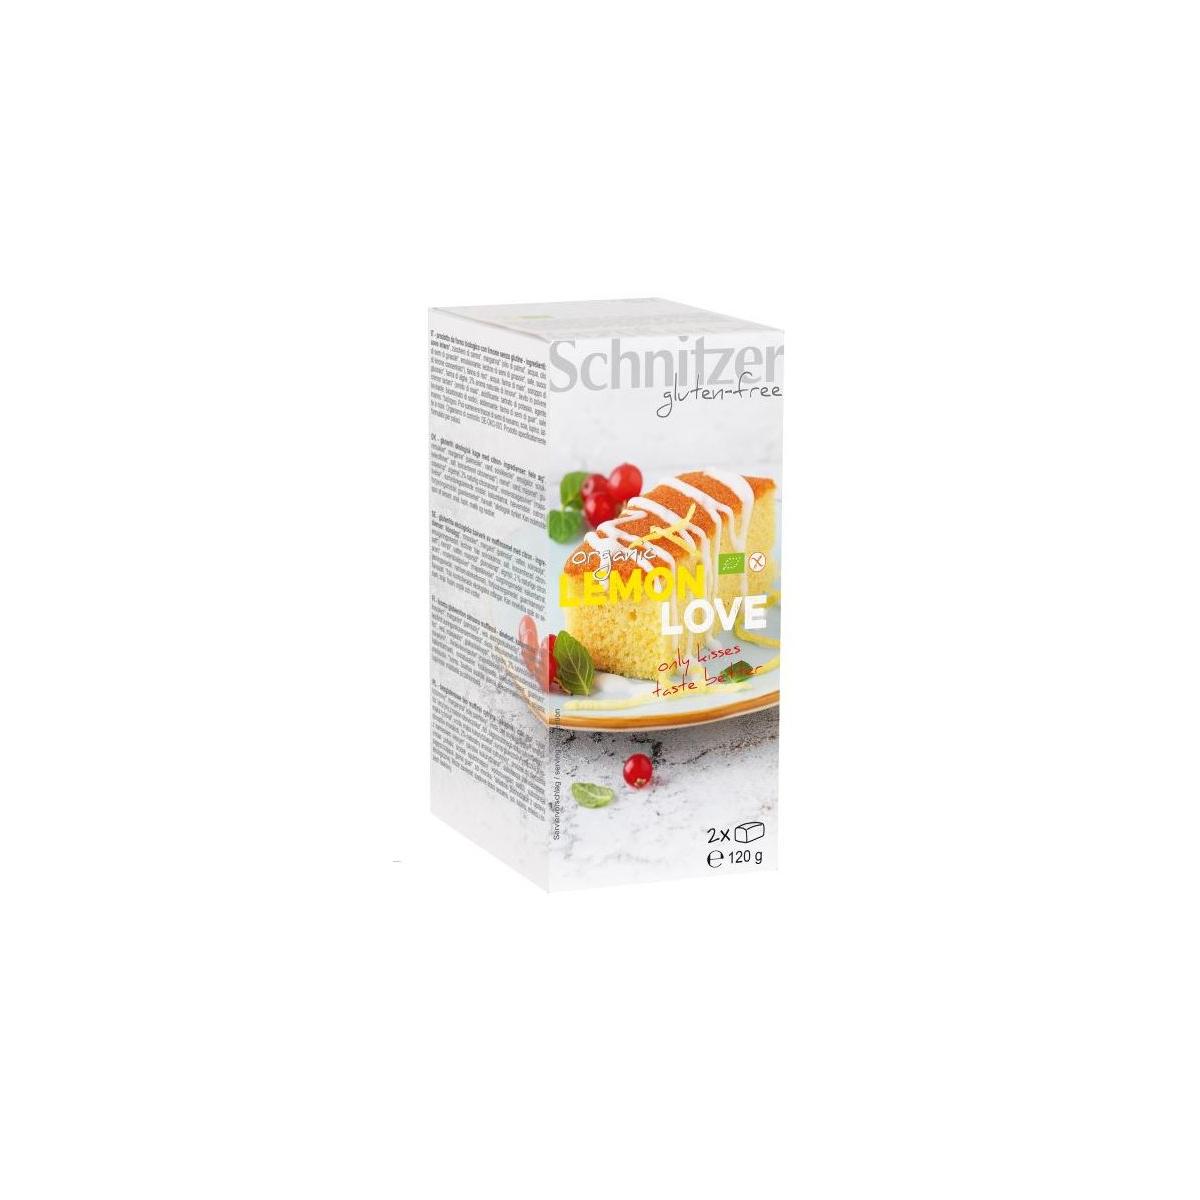 Bio Lemon Love Minicakes 2 Stk glutenfrei